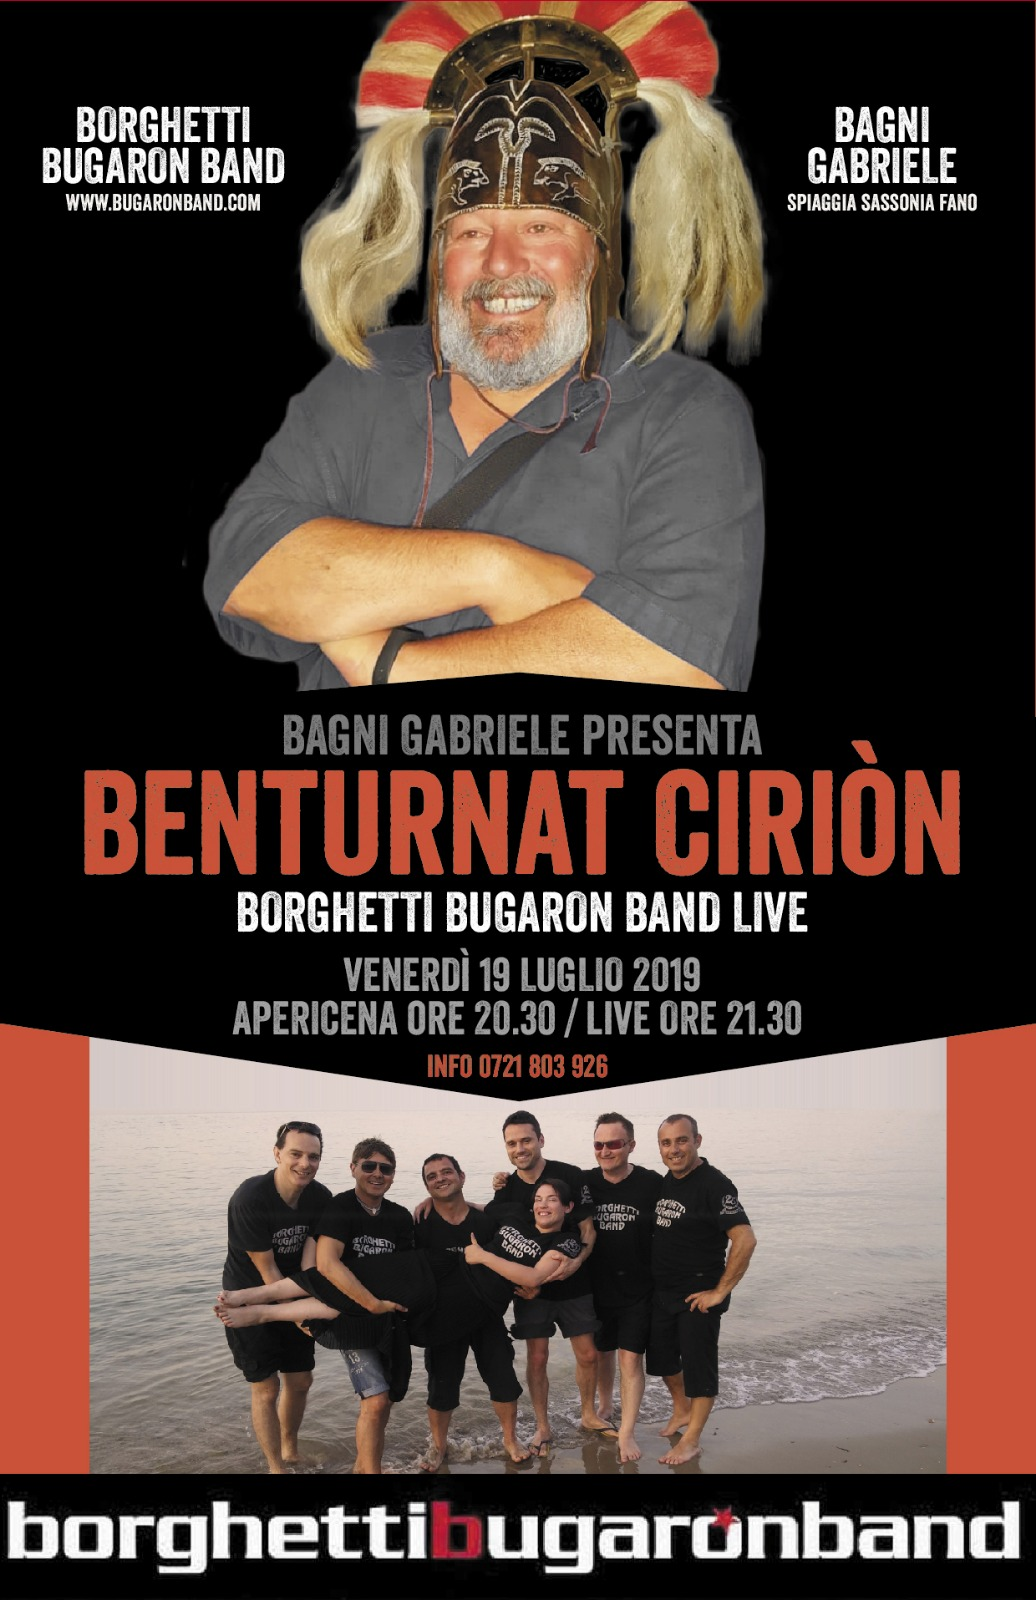 Bugaron live - Bagni Gabriele 2019